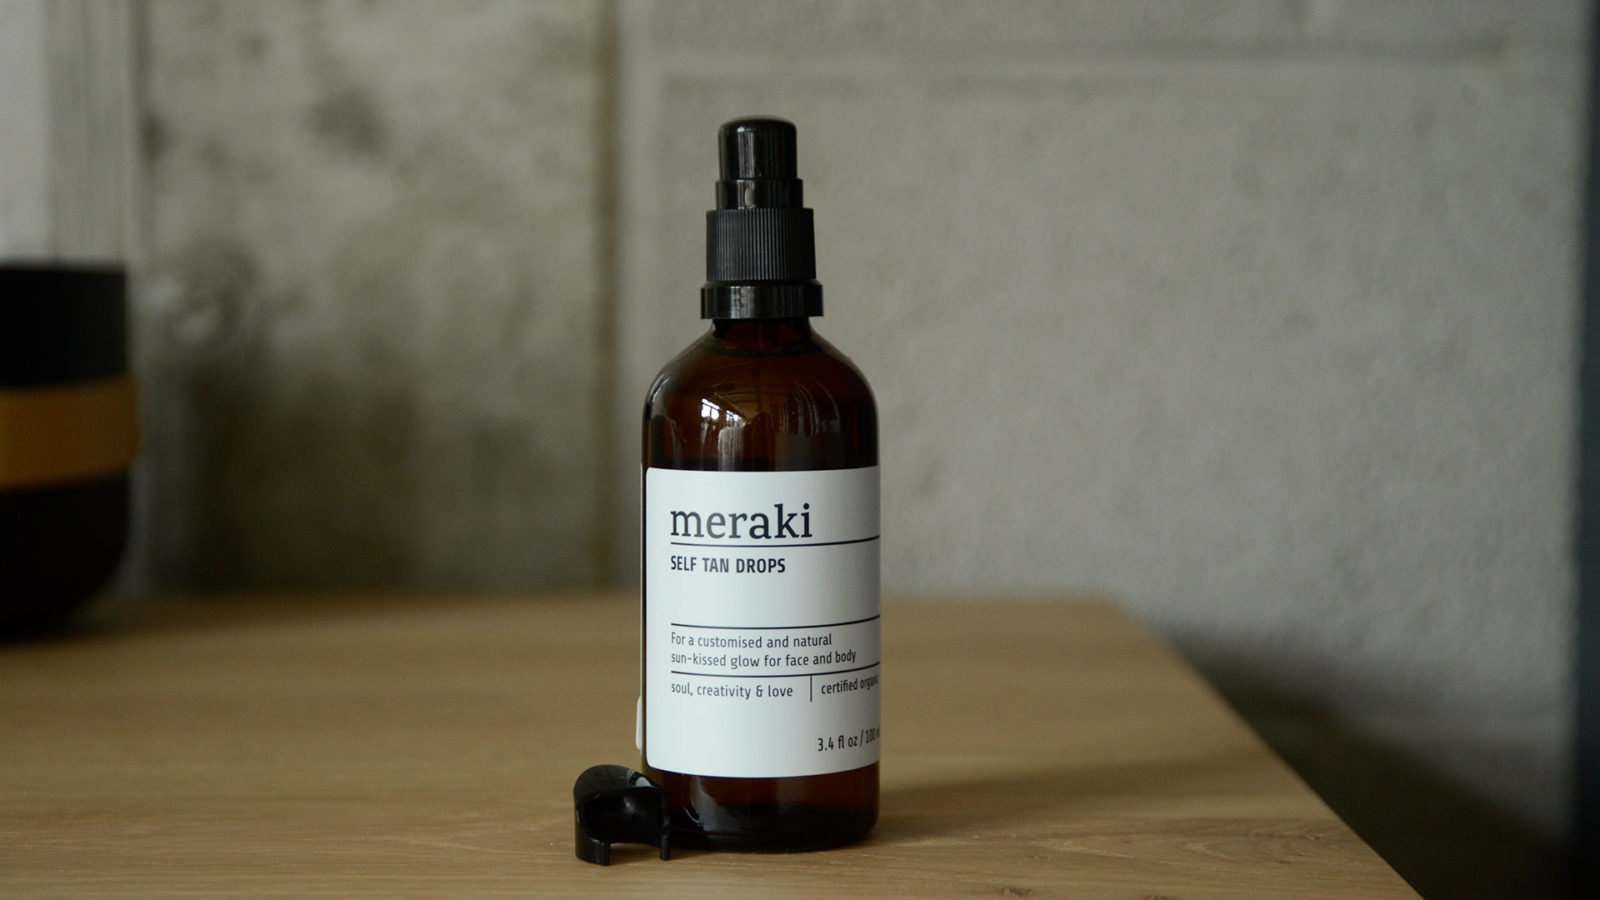 Meraki organic tanning drops